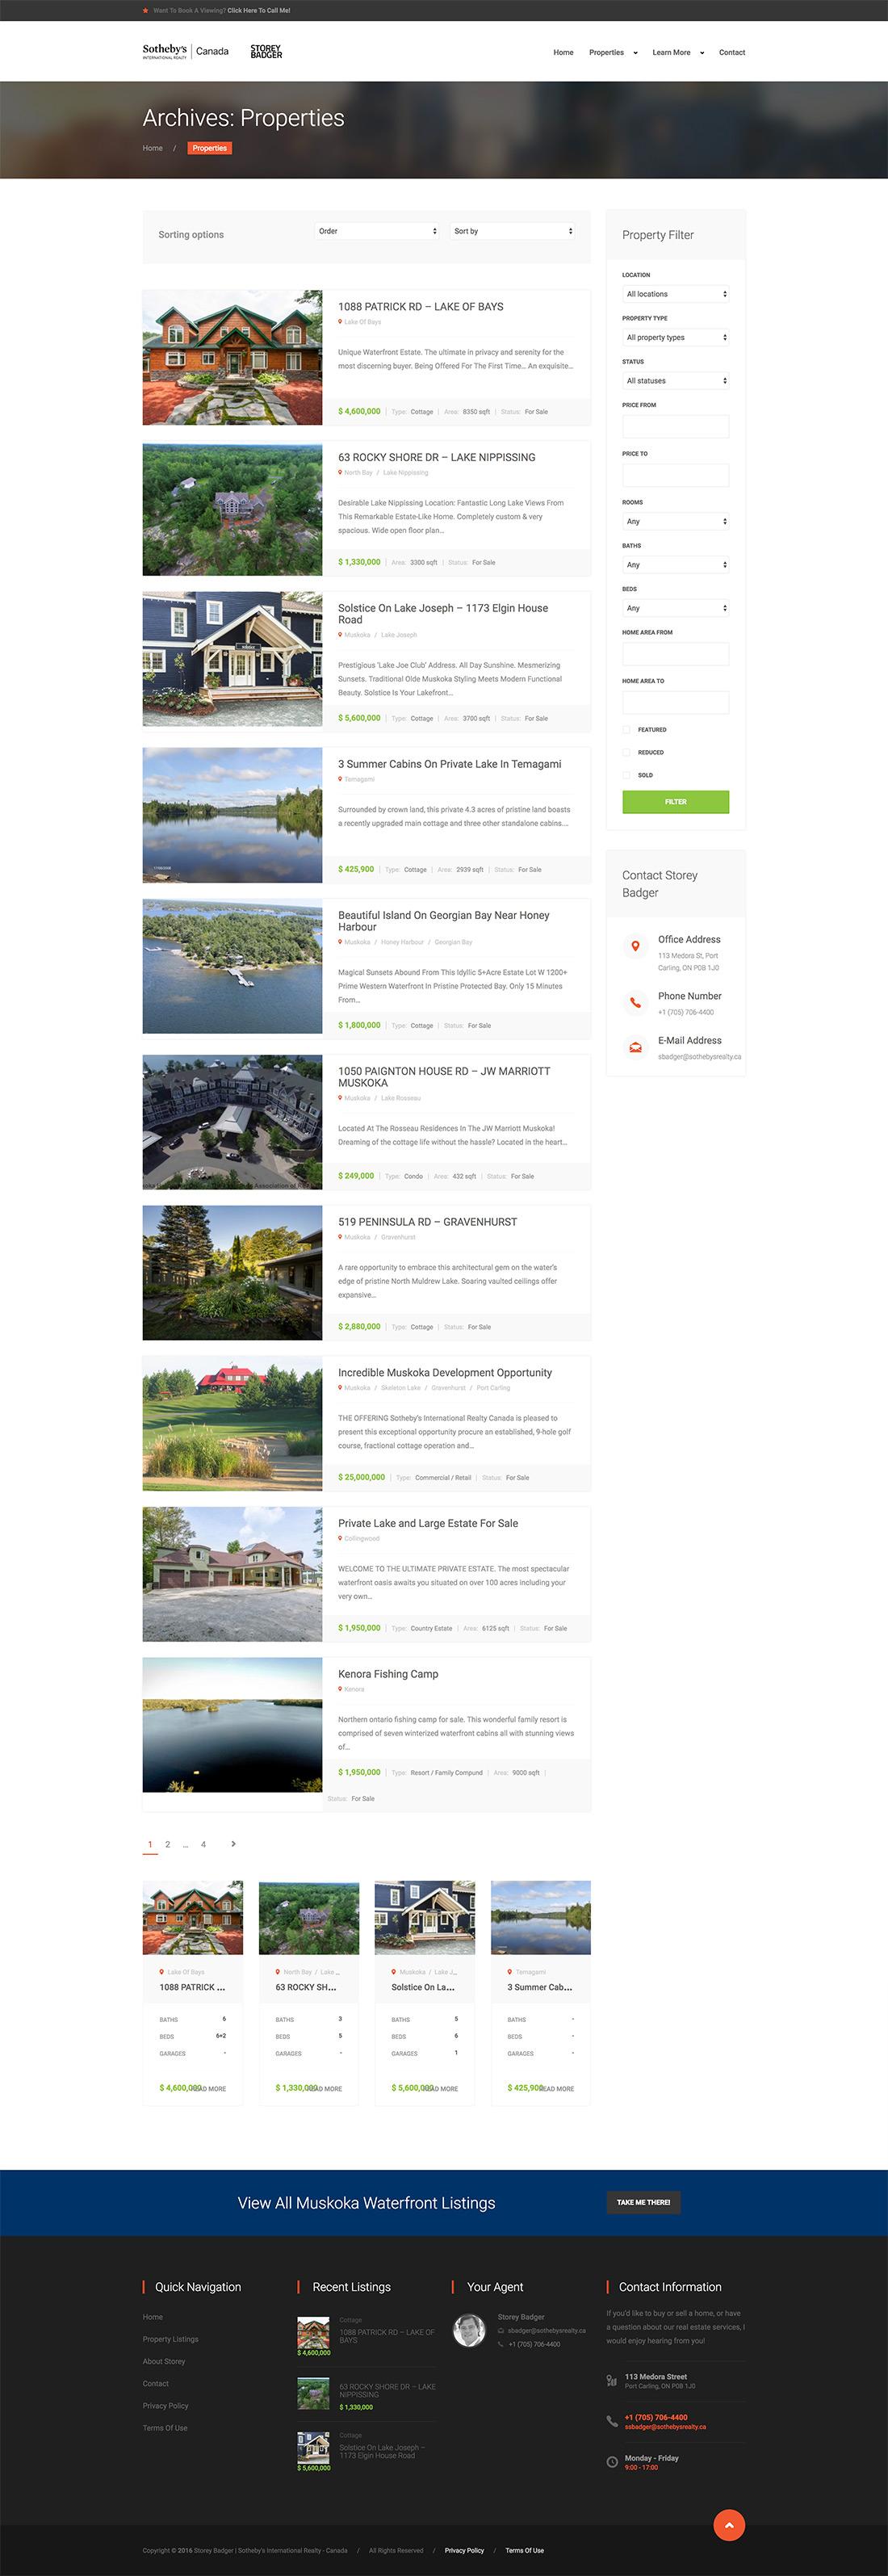 Storey Badger - Web Site 02